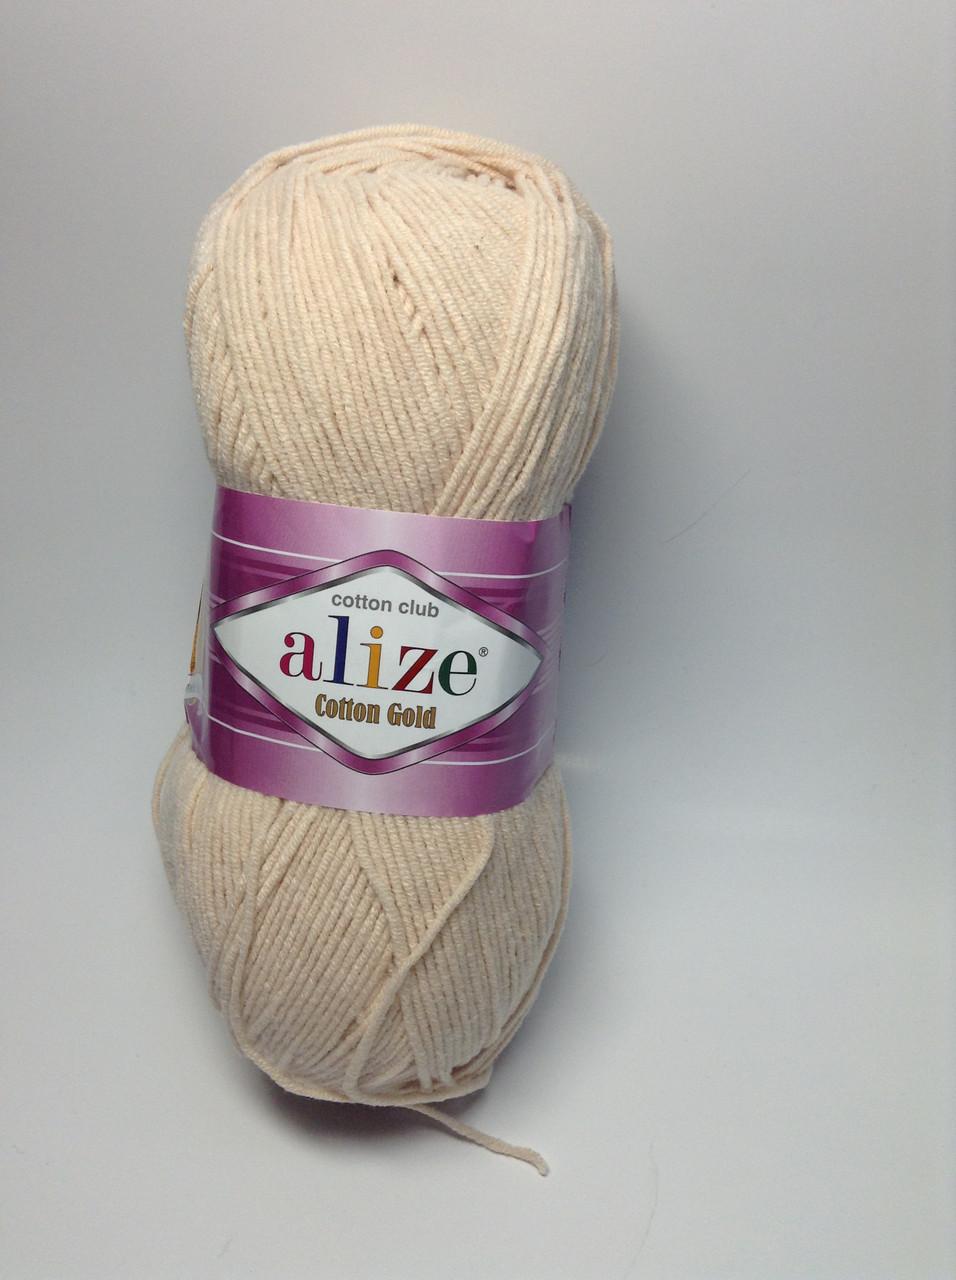 Пряжа cotton gold - цвет молочно-бежевый